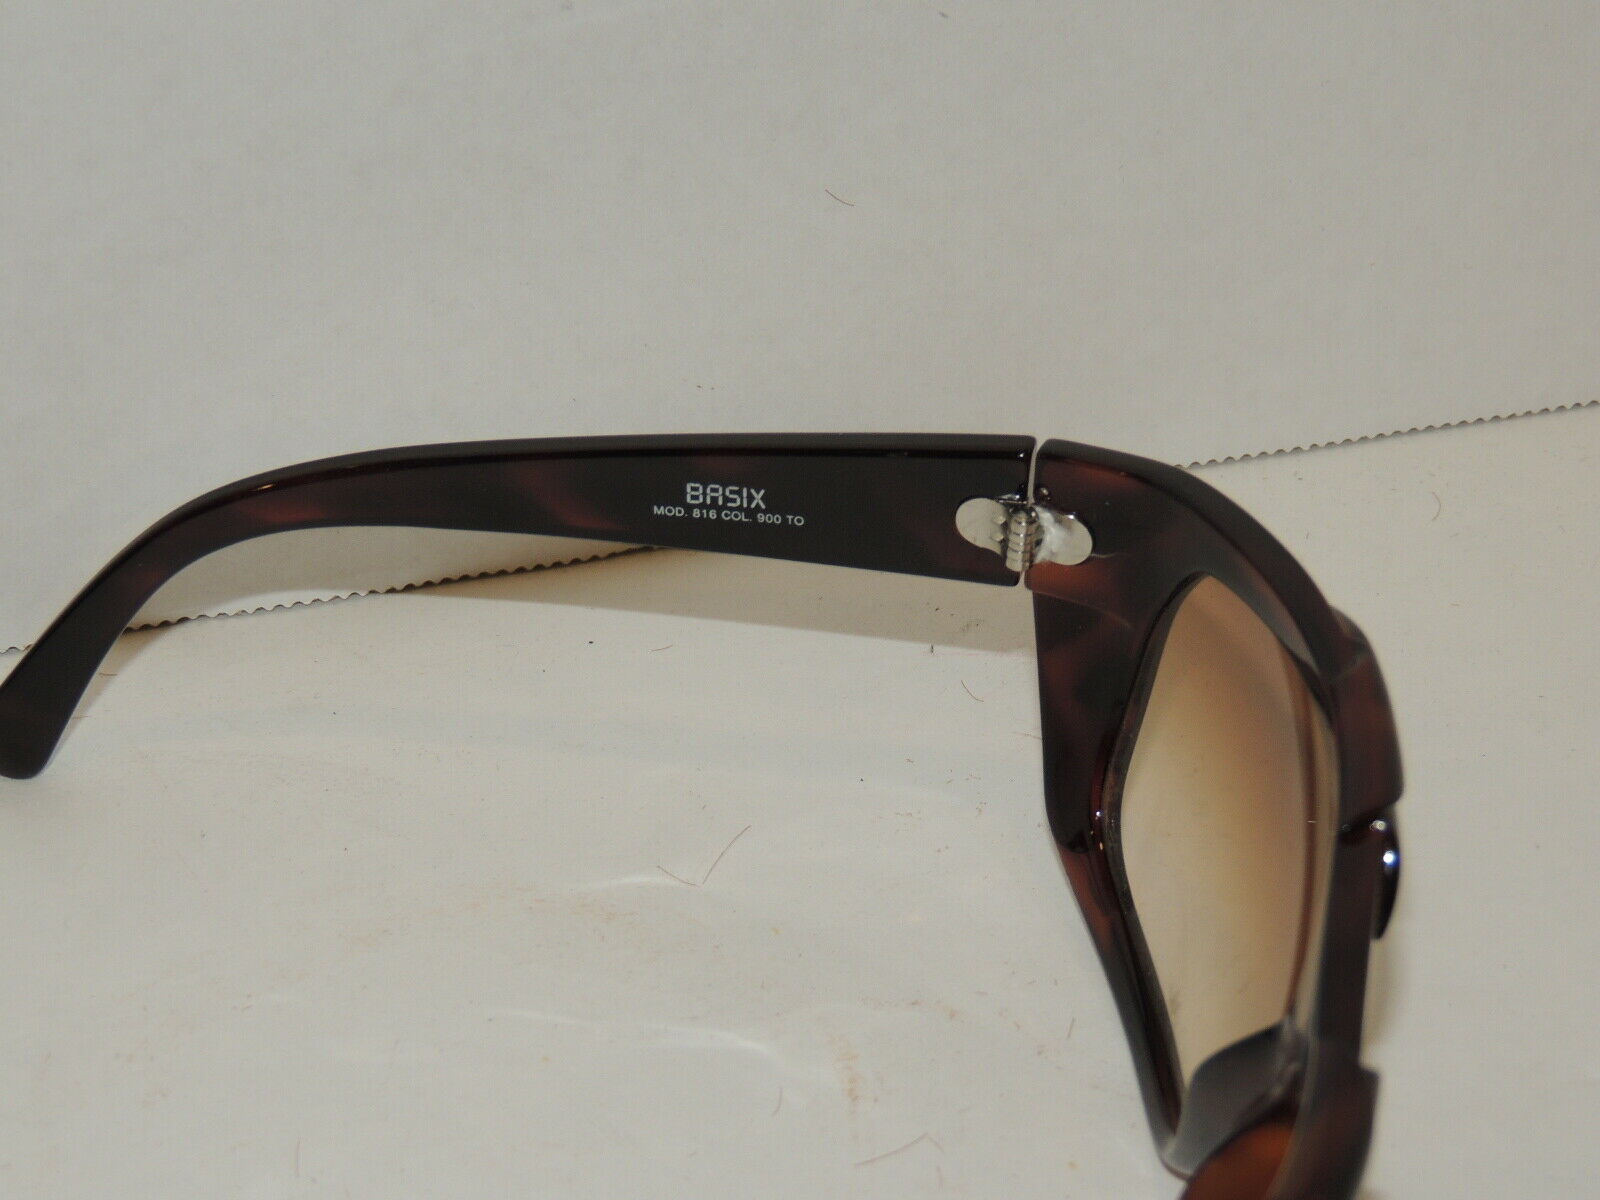 Gianni Versace Basix Brown Sunglasses  - image 3